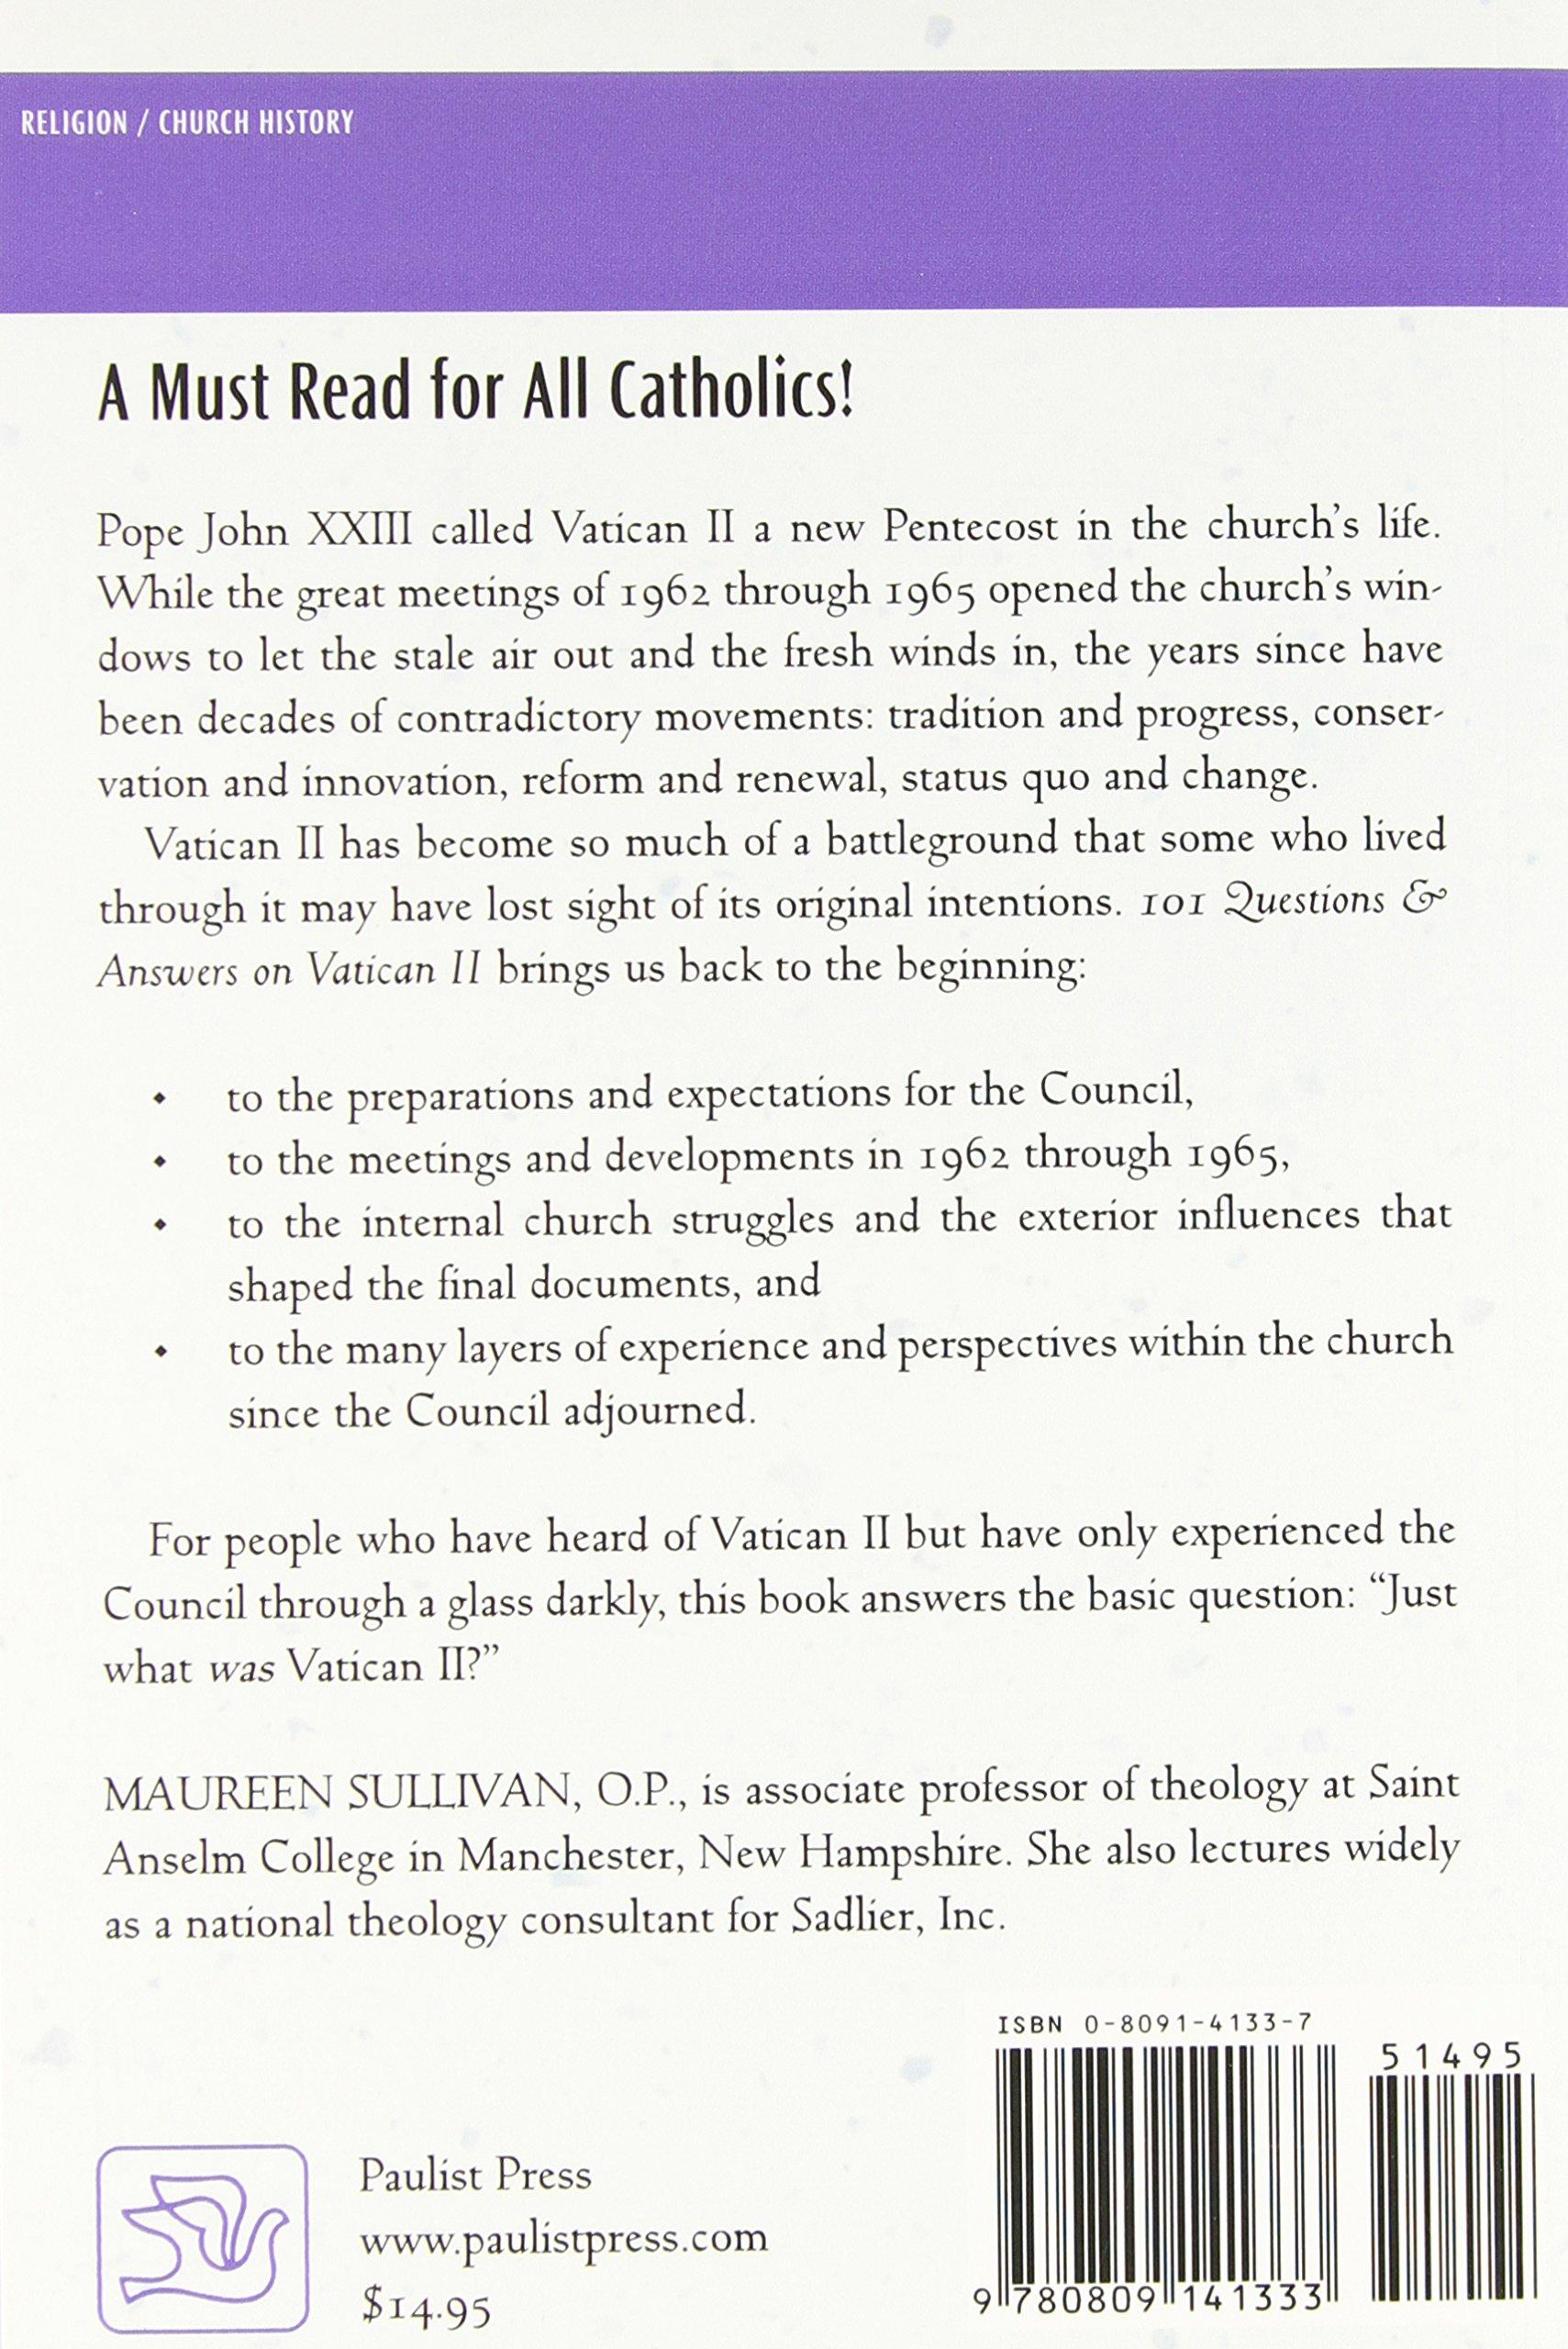 101 Questions and Answers on Vatican II: Maureen Sullivan: 9780809141333:  Amazon.com: Books